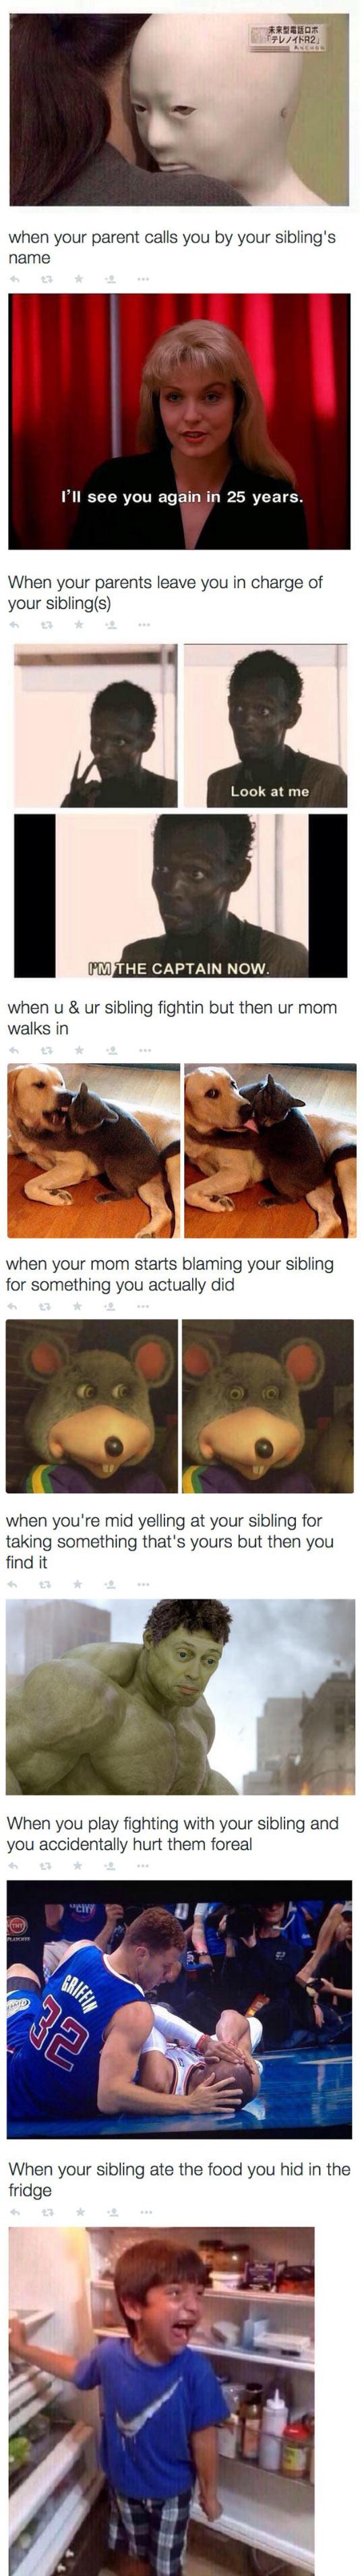 2funny-dog-sibling-behave-fights-parents